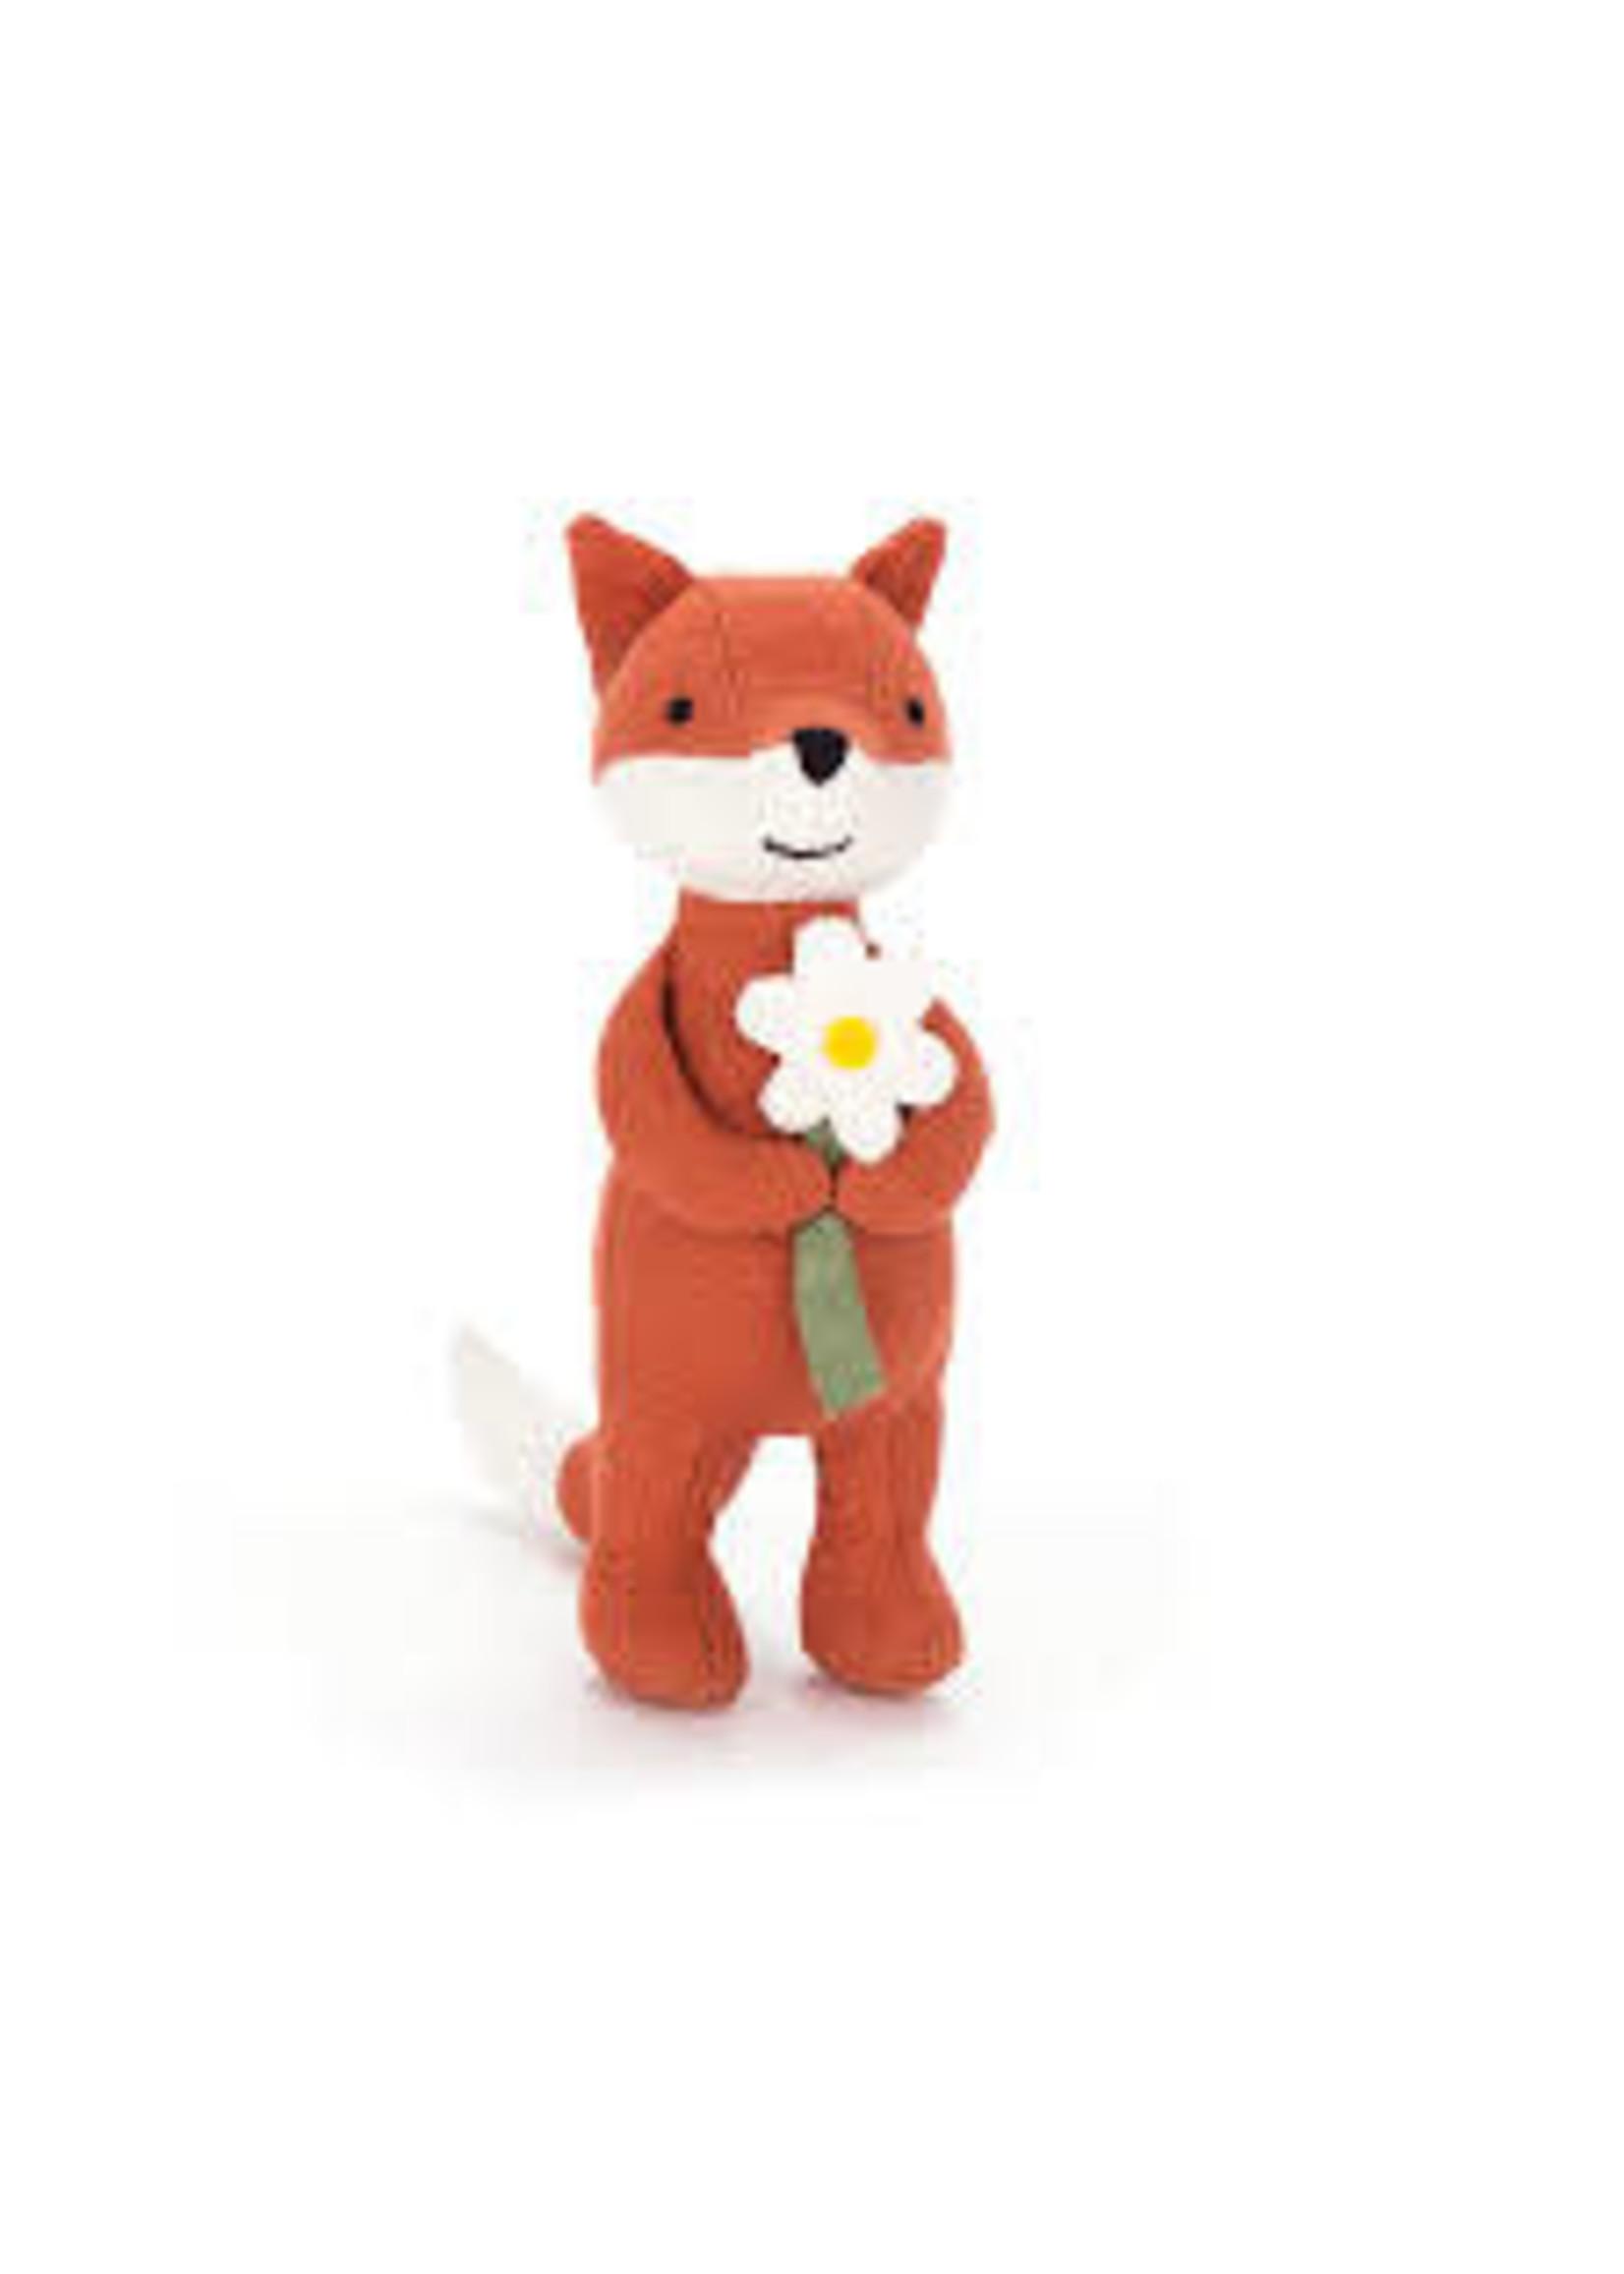 Jellycat jc mini messenger